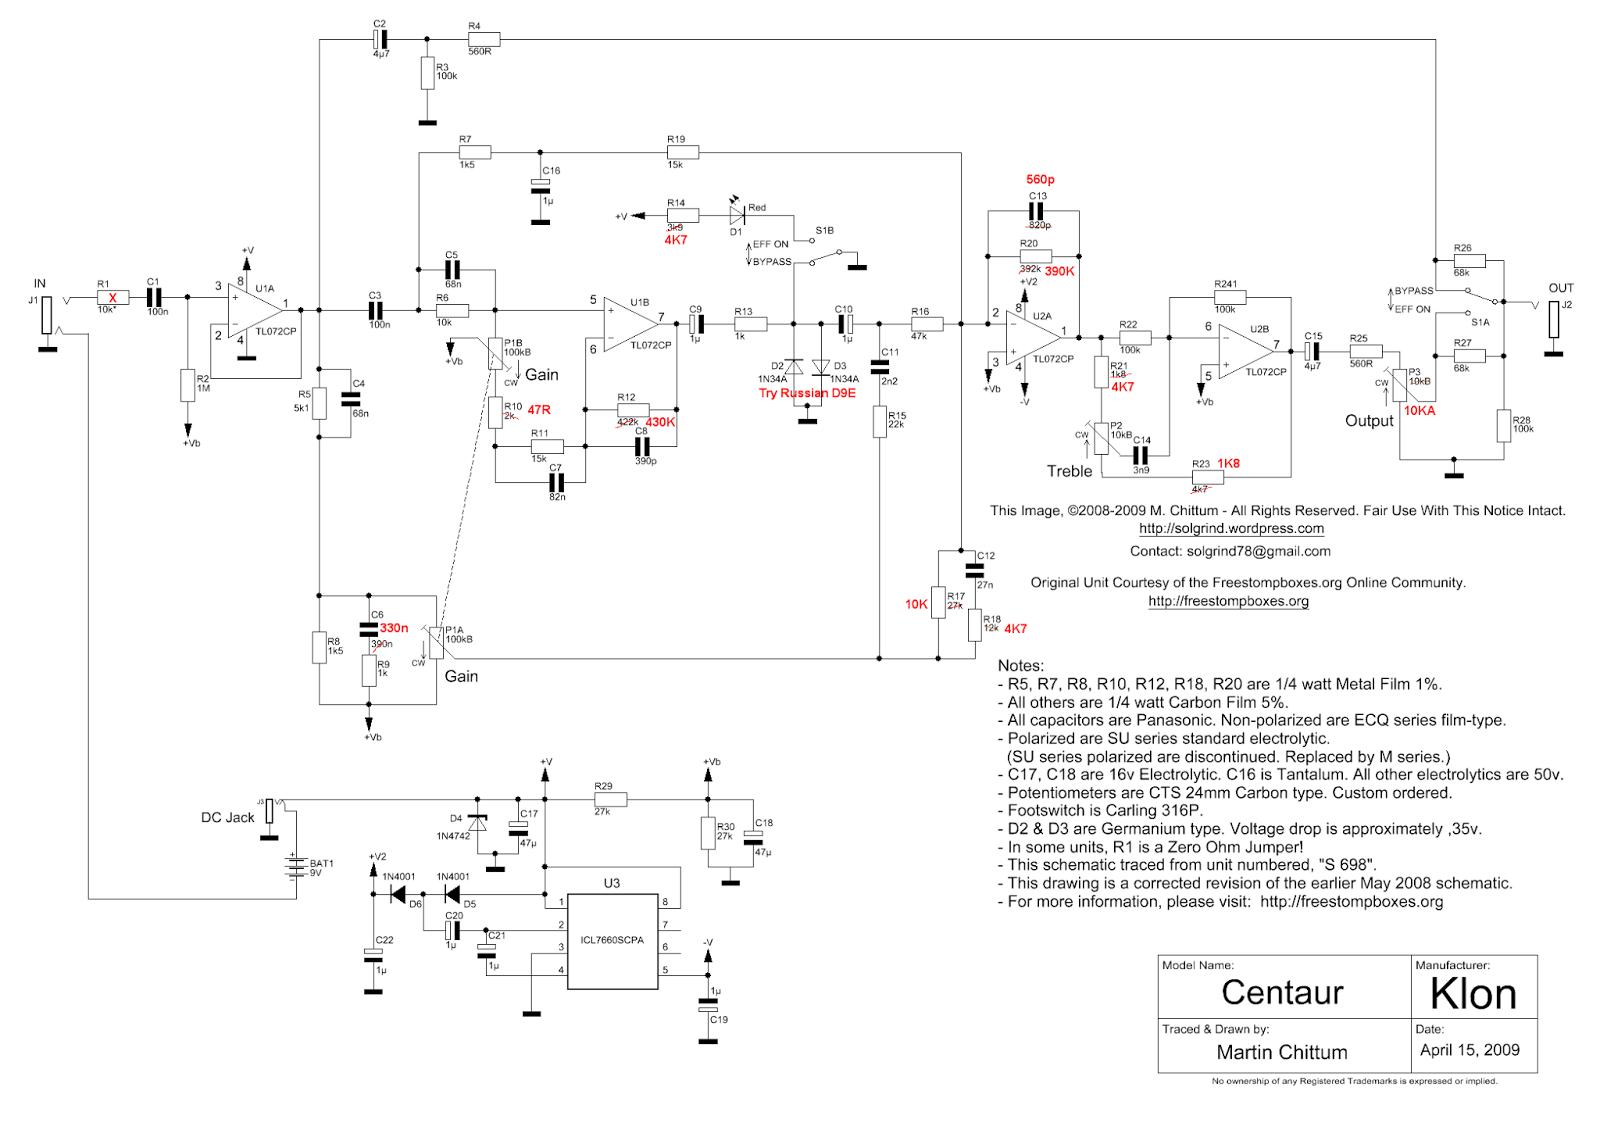 Rf Modulator Hookup Diagram 2004 Ford F250 Lariat Radio Wiring S Schematic Get Free Image